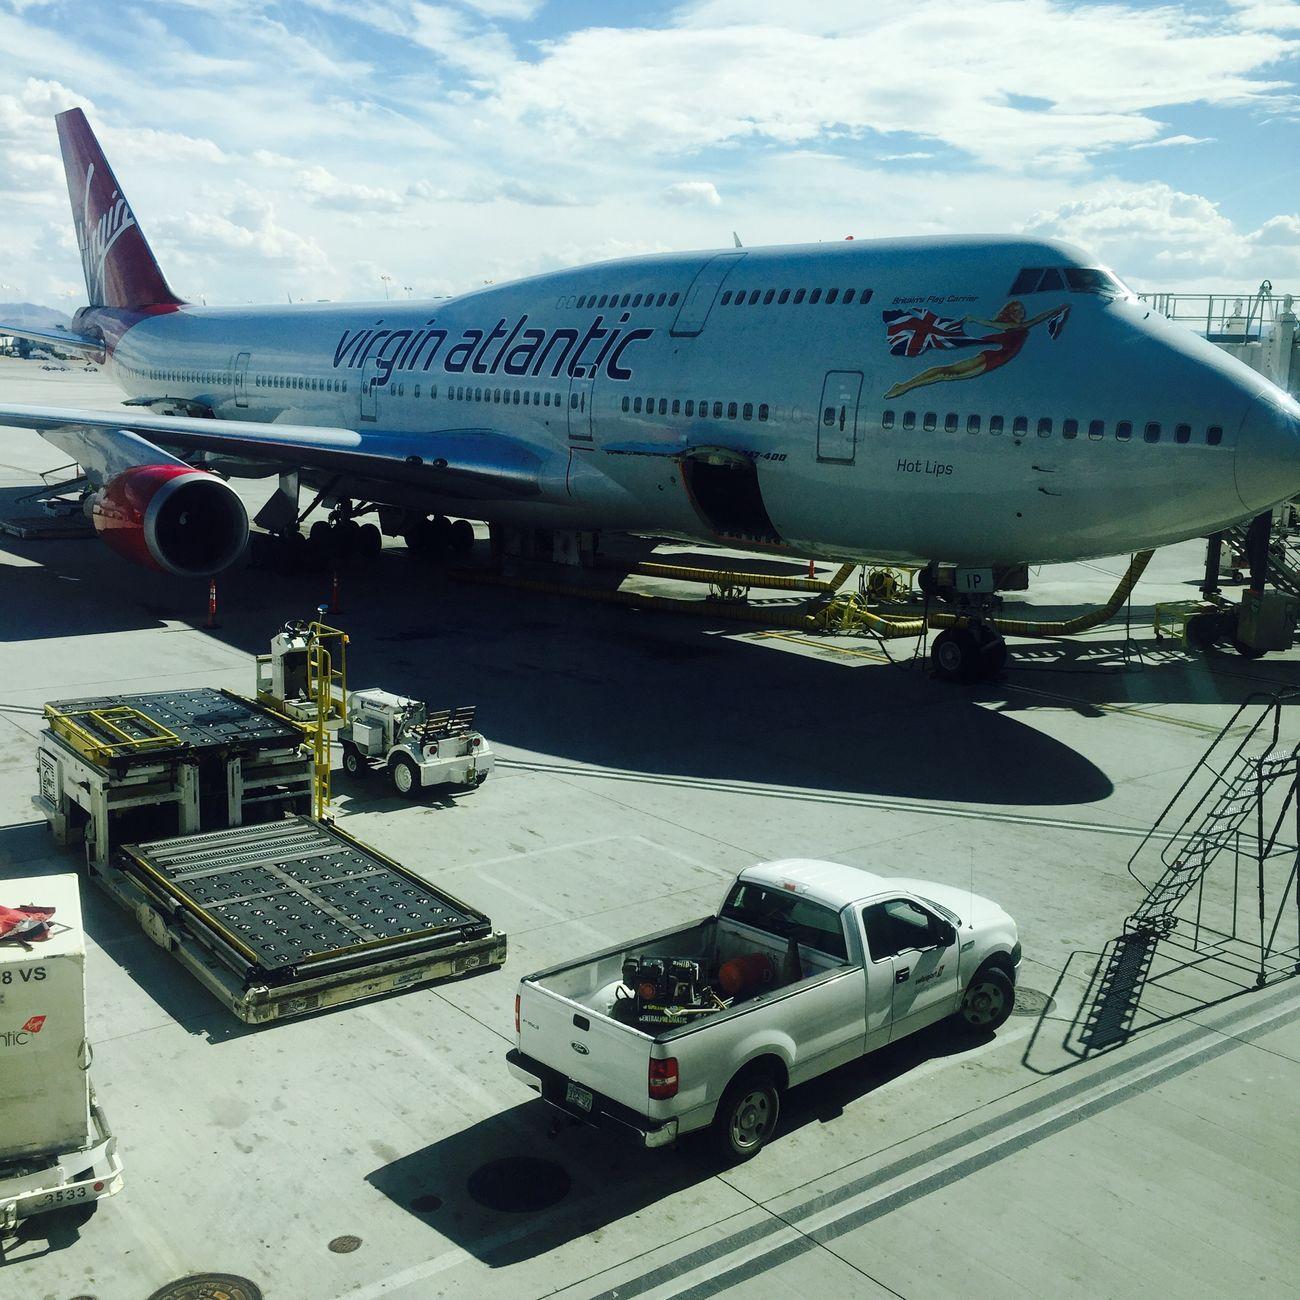 Virgin Atlantic Plane Going Home Leaving Las Vegas Airport